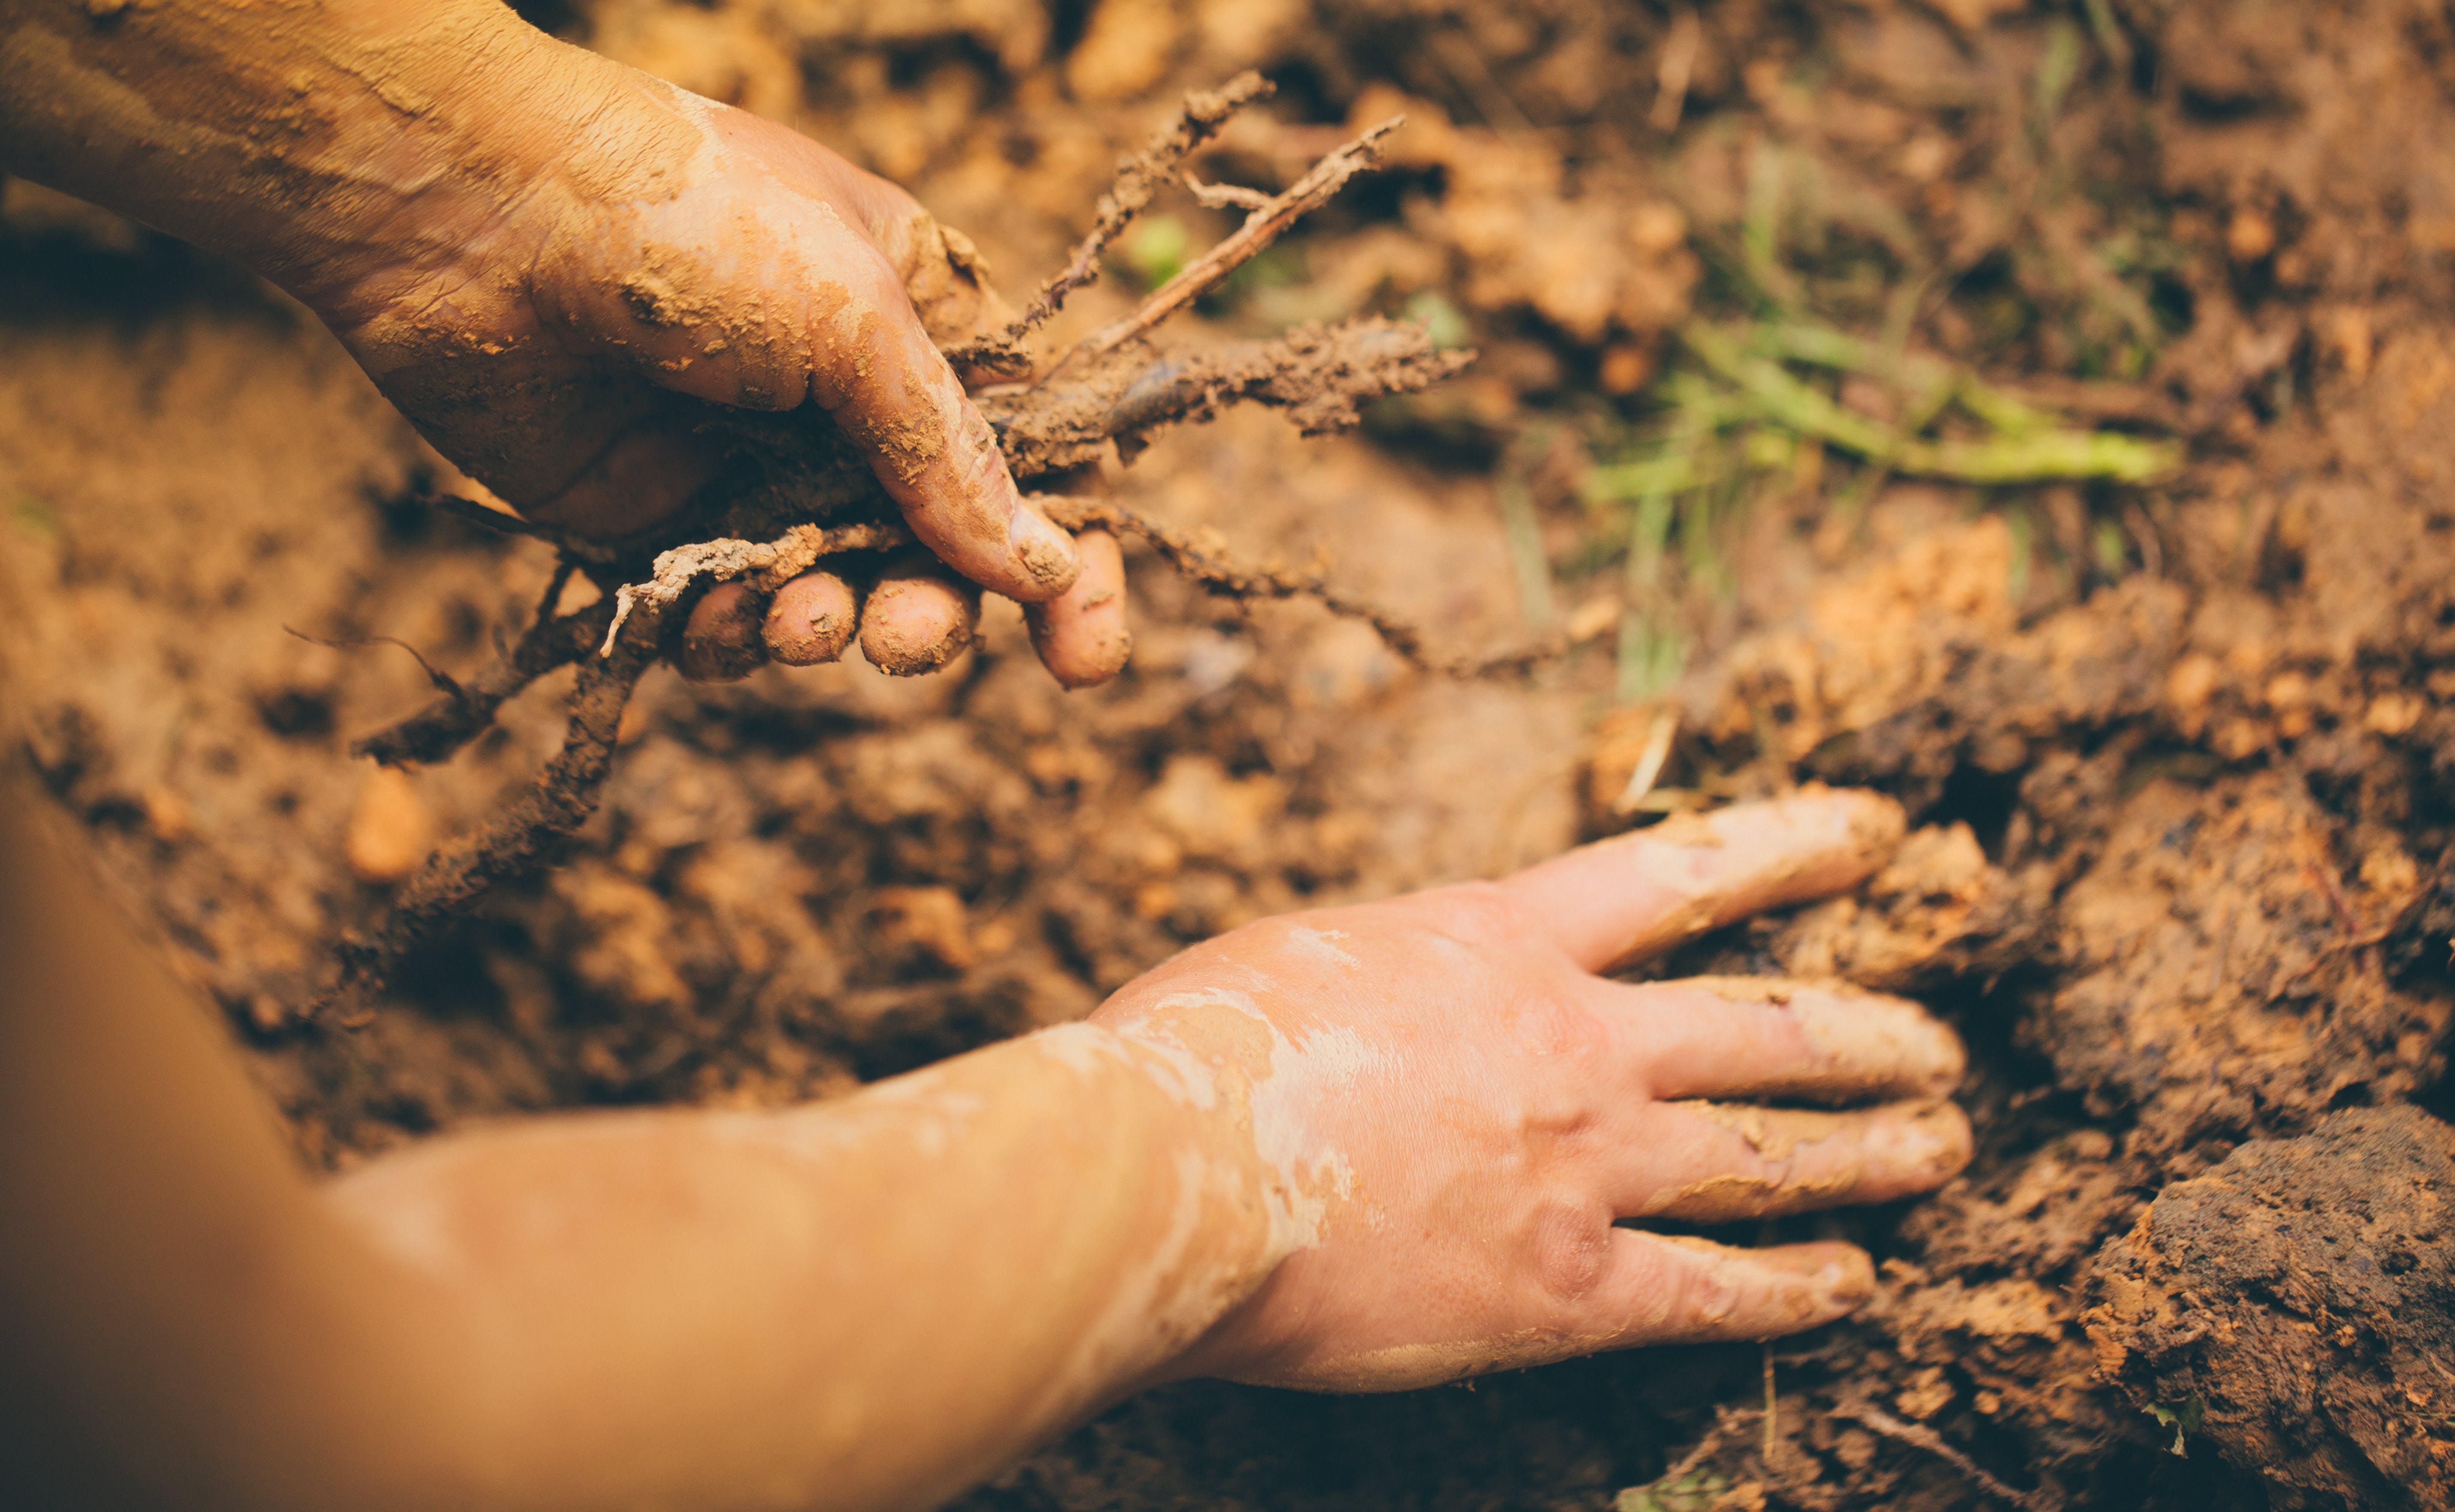 Person Holding Sticks Digging Mud Soil